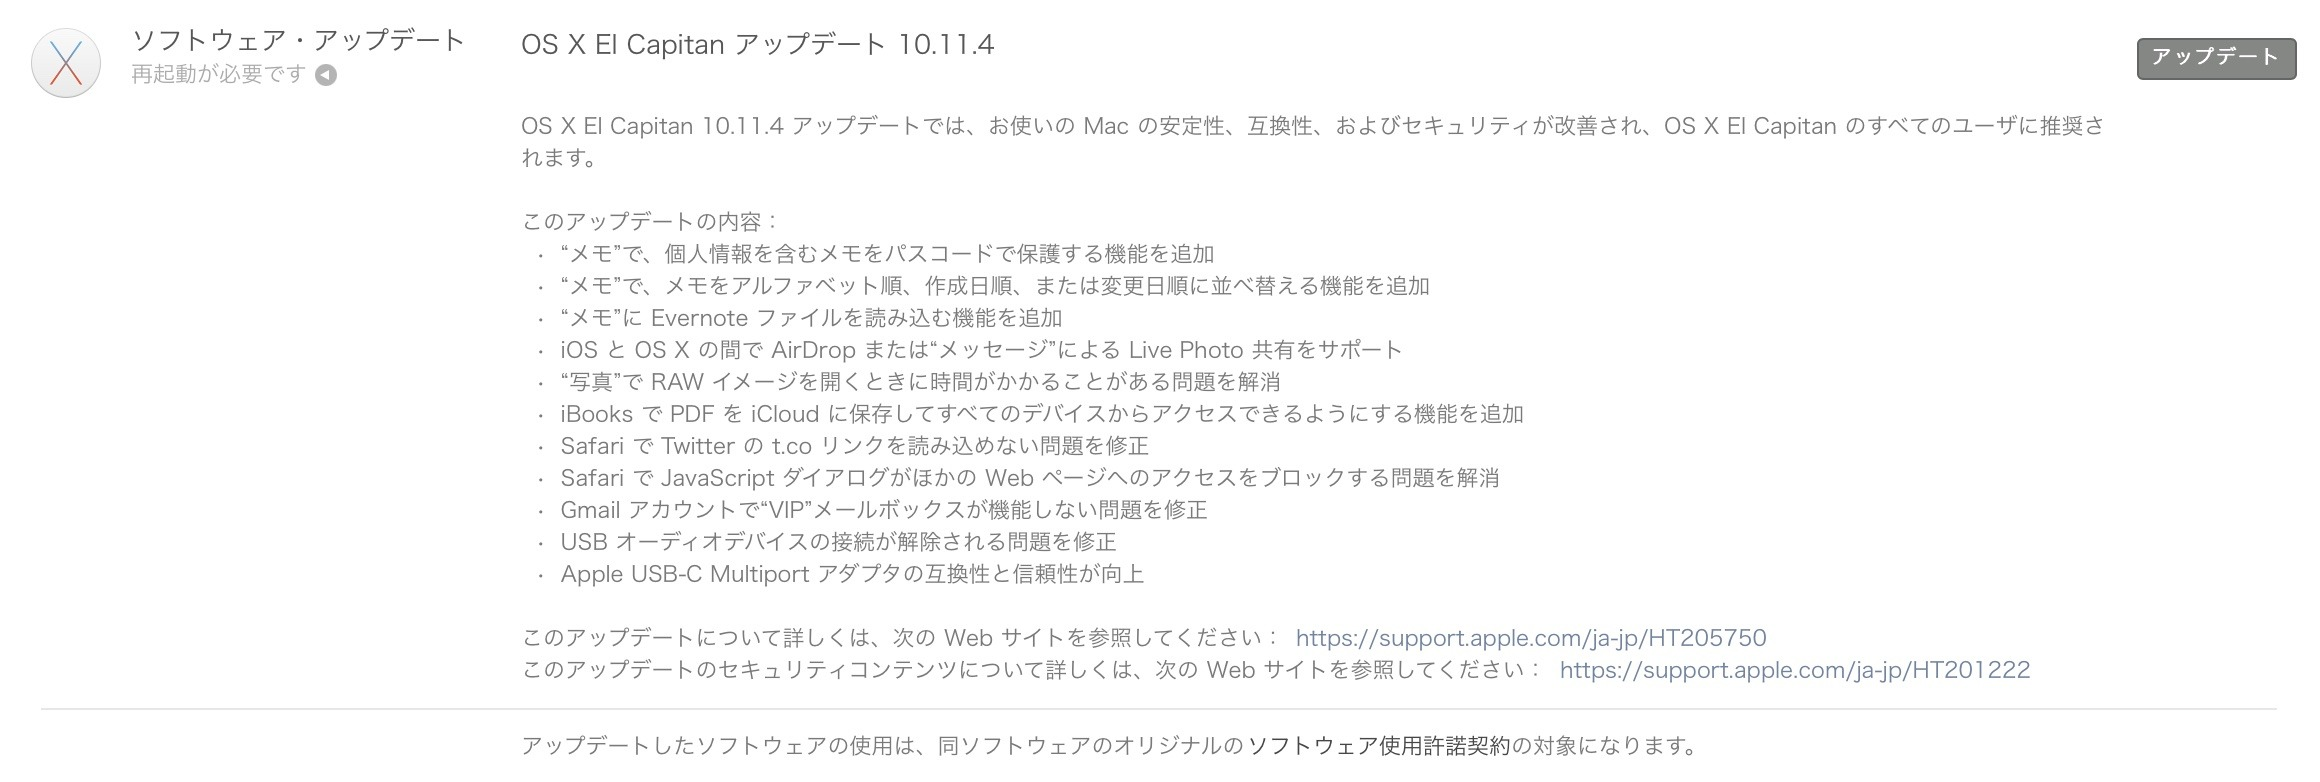 macos10.11.4